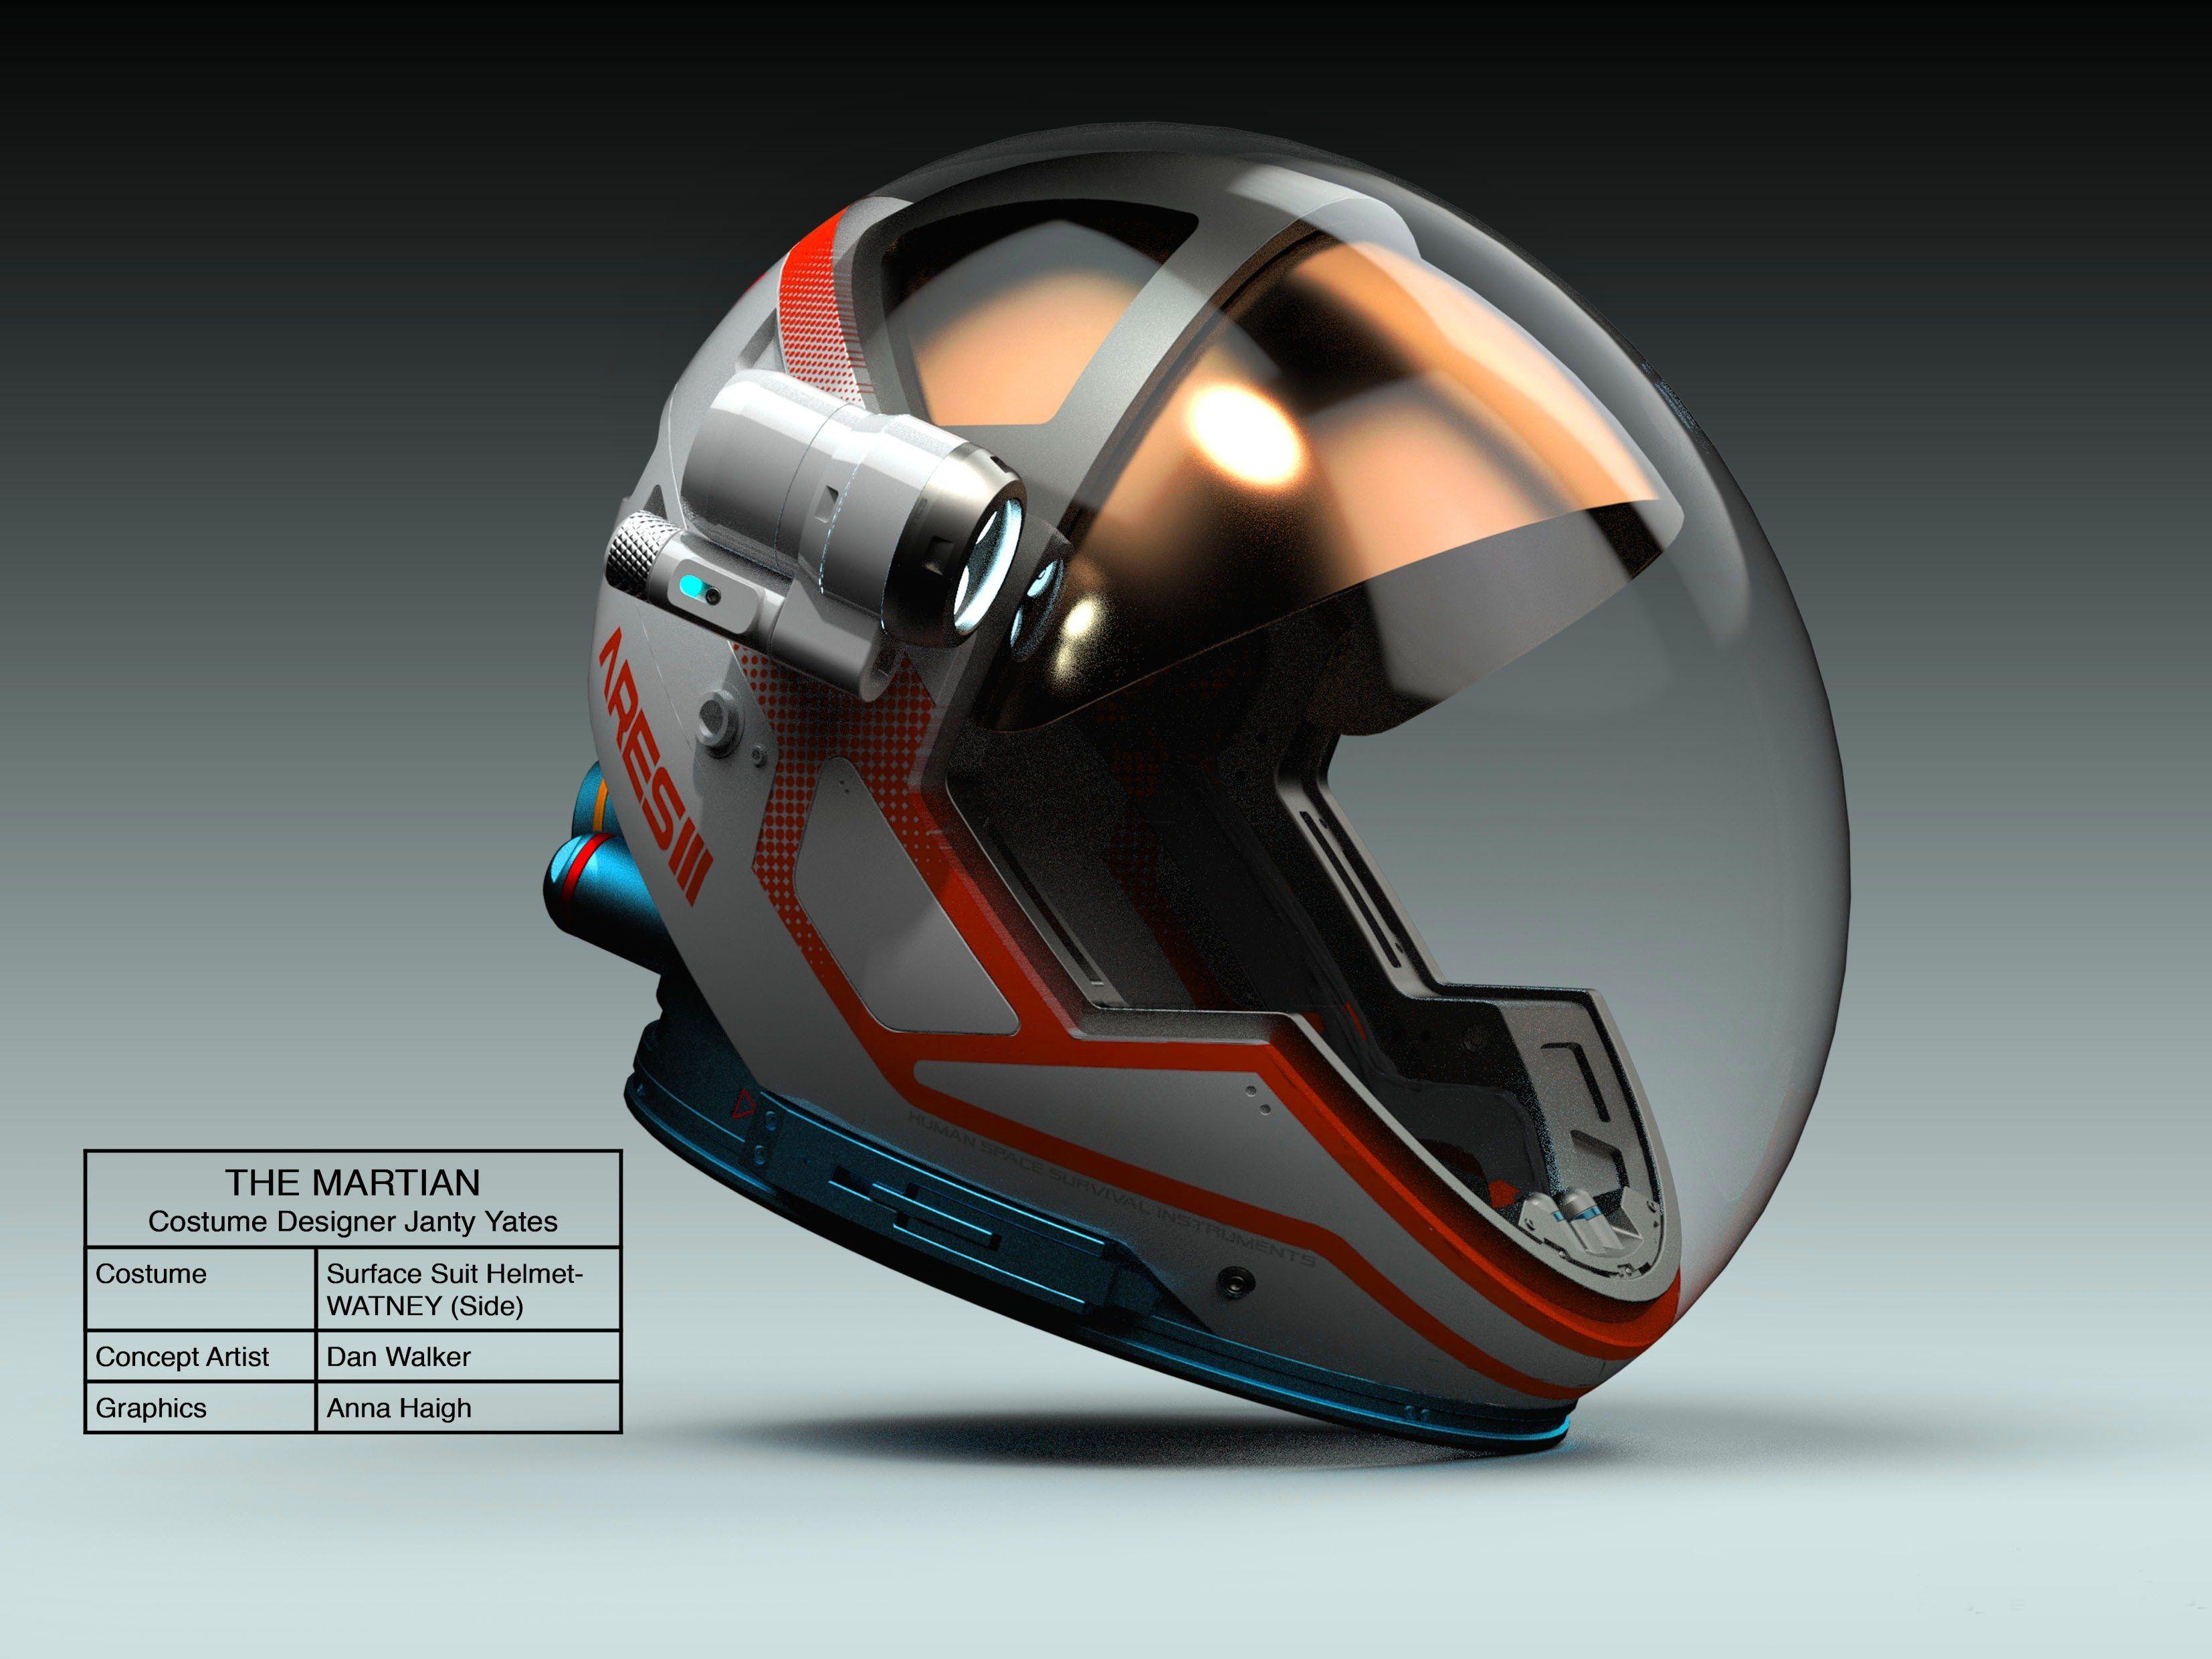 image-2.jpg (3307×2480) | Sci-Fi | Pinterest | Space suits ...